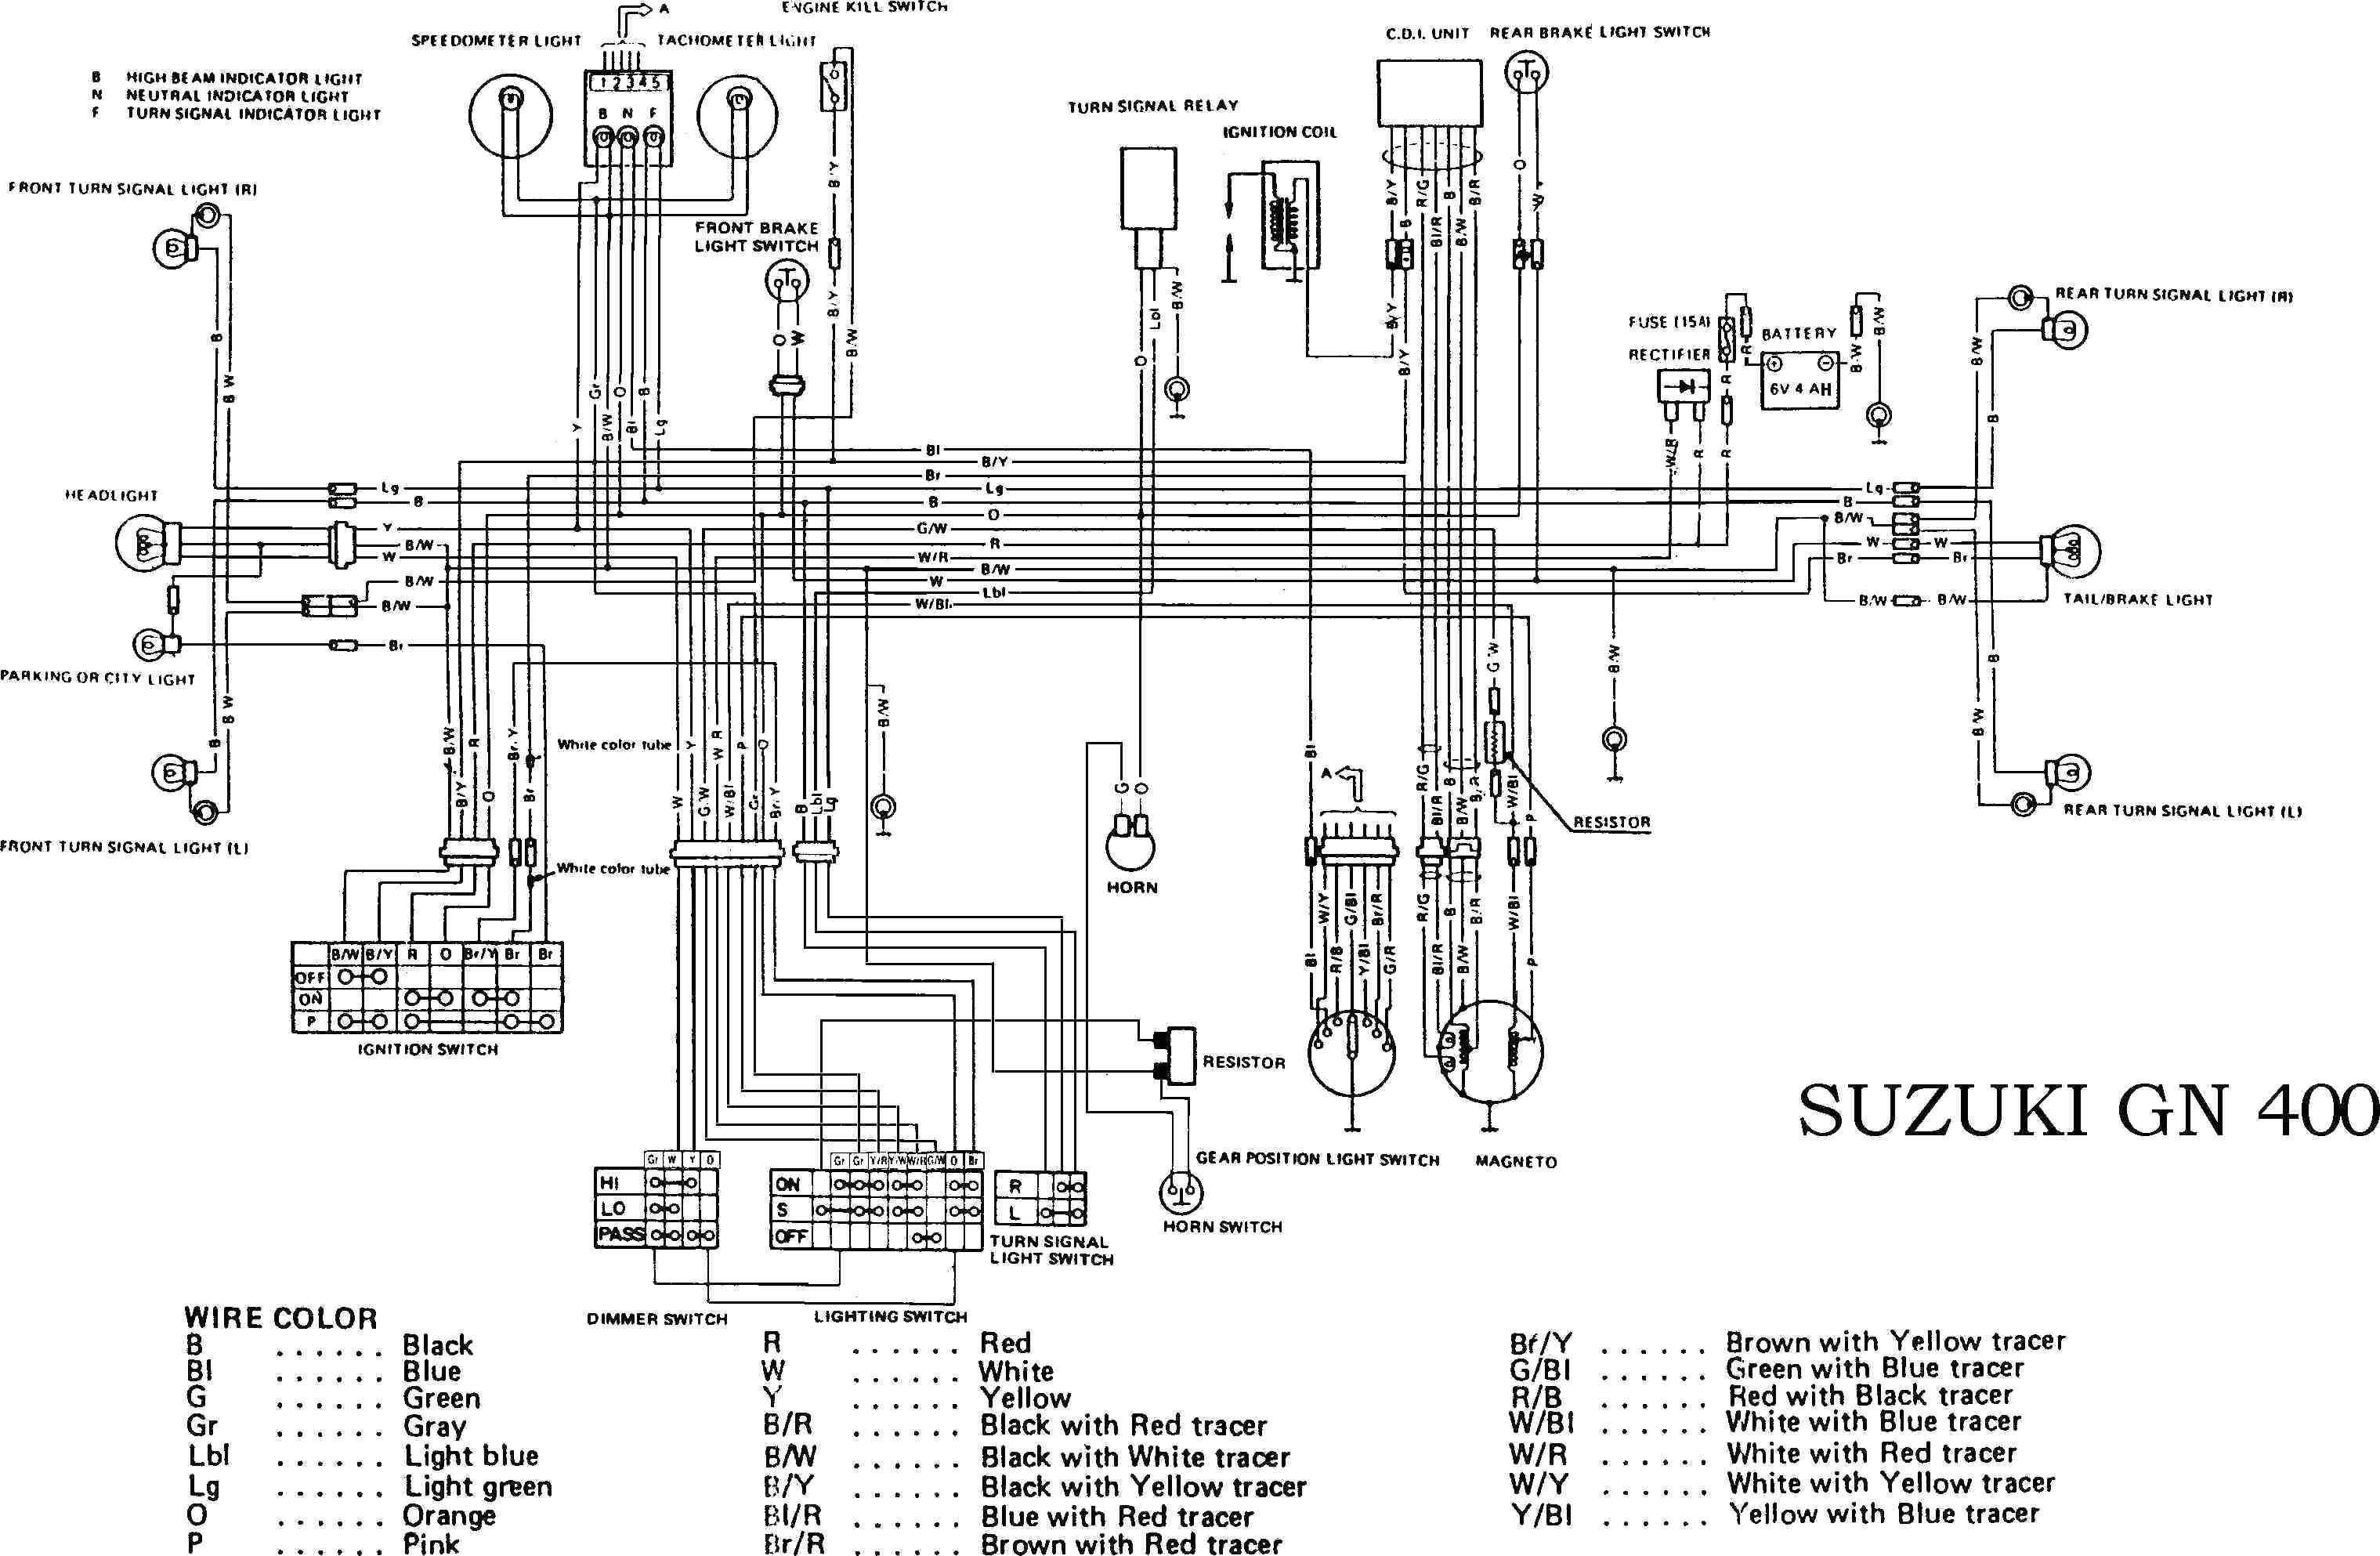 Thermocouple Wire Color Code | Gas Fireplace Wiring Tic 5 14 Danishfashion Mode De